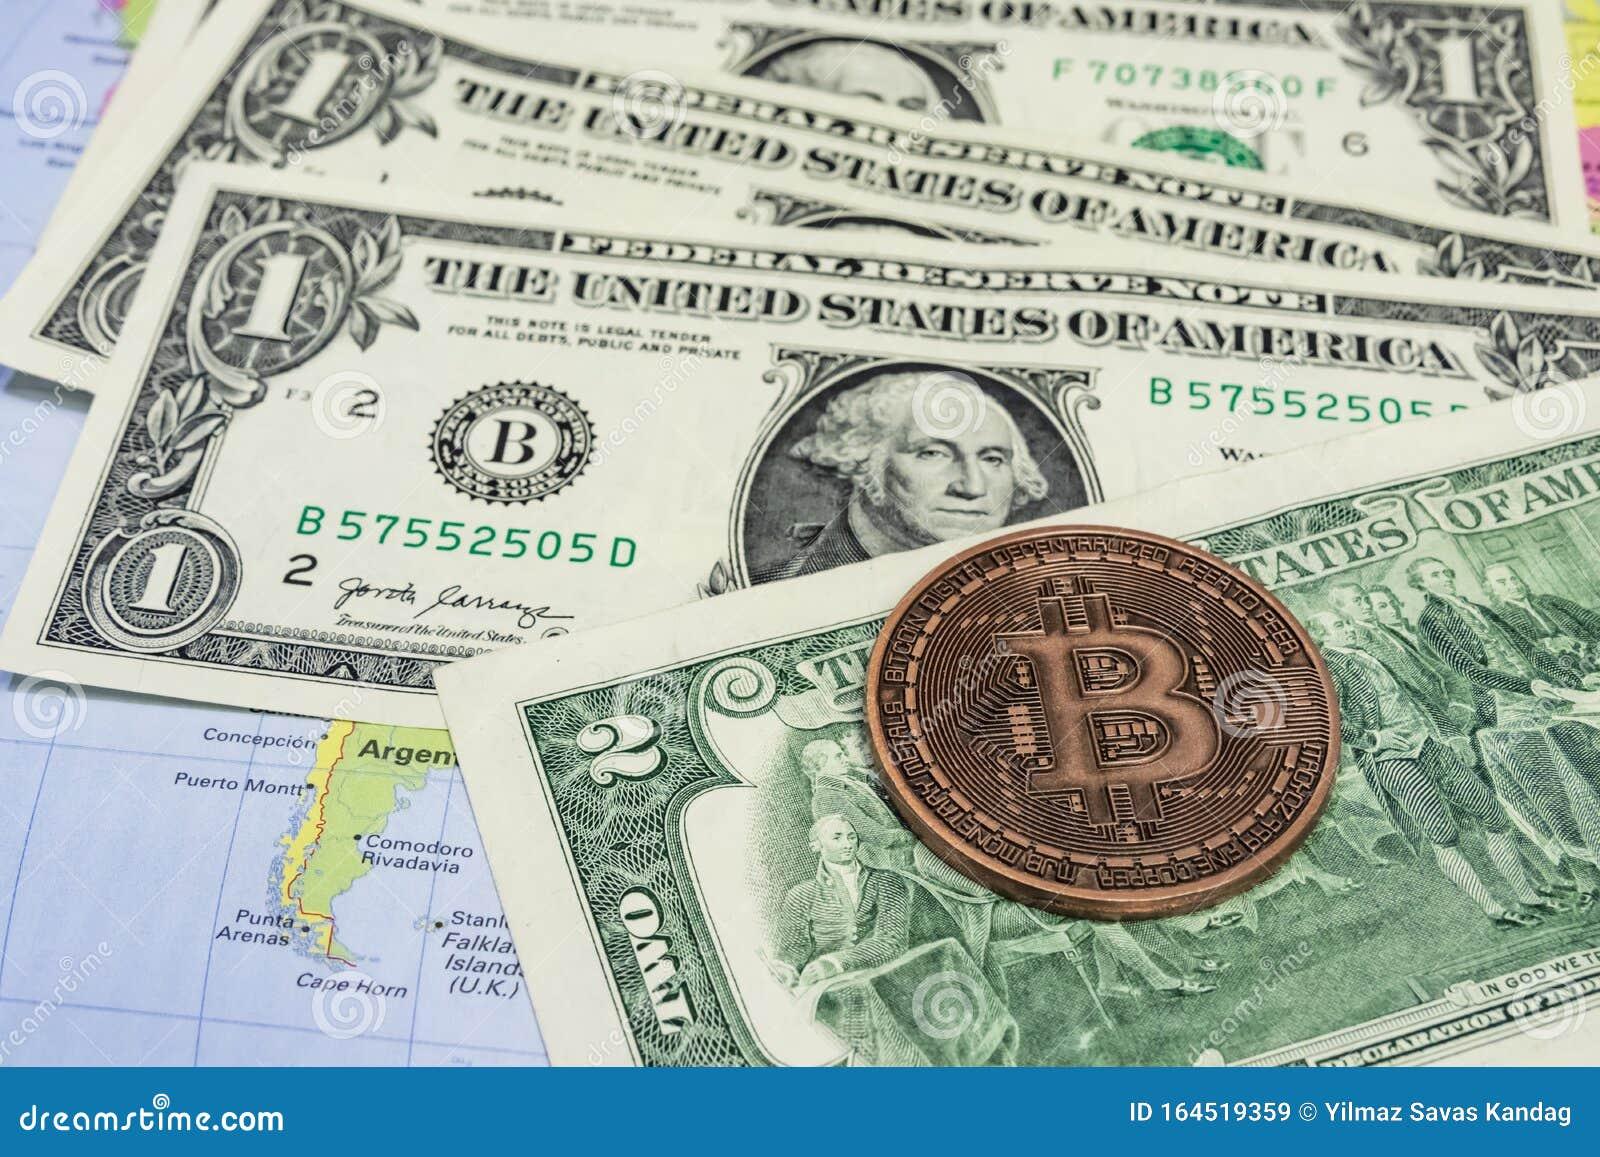 Leelanau physical bitcoins and bitcoins to dollars ou texas betting line 2021 chevy